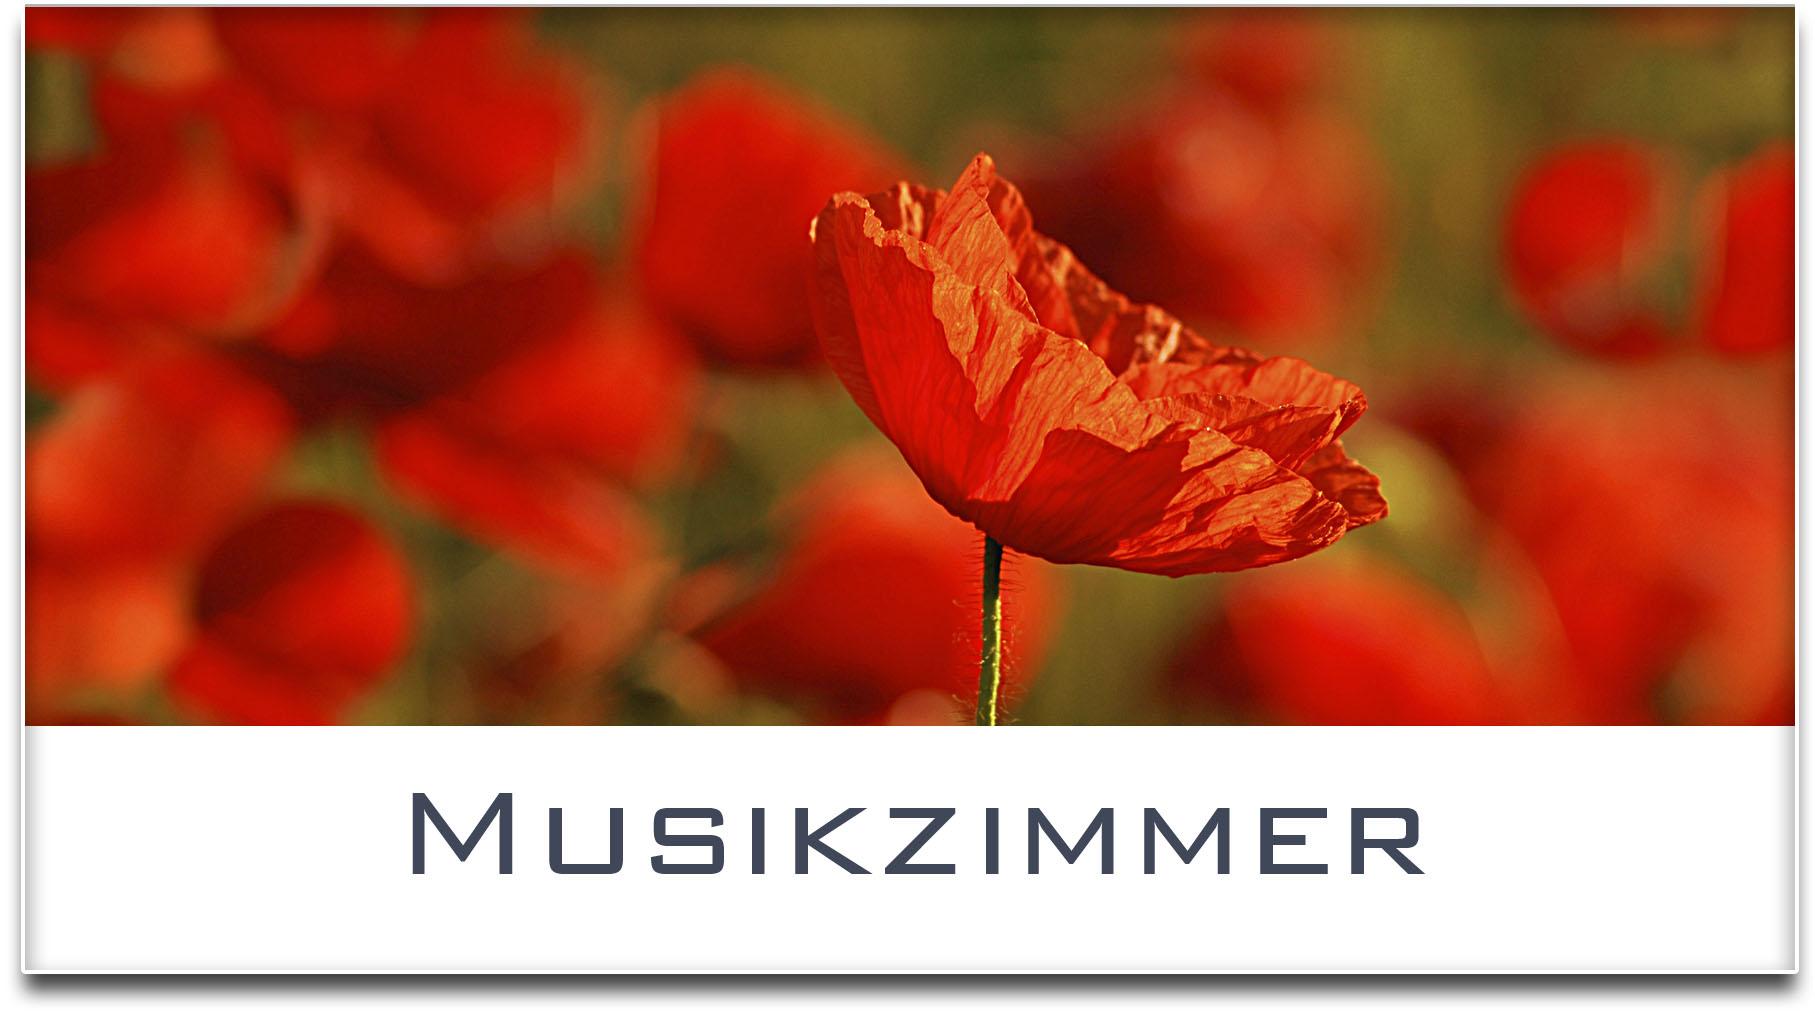 Türschild / Haustürschild / Mohnfeld / Musikzimmer / Selbstklebend